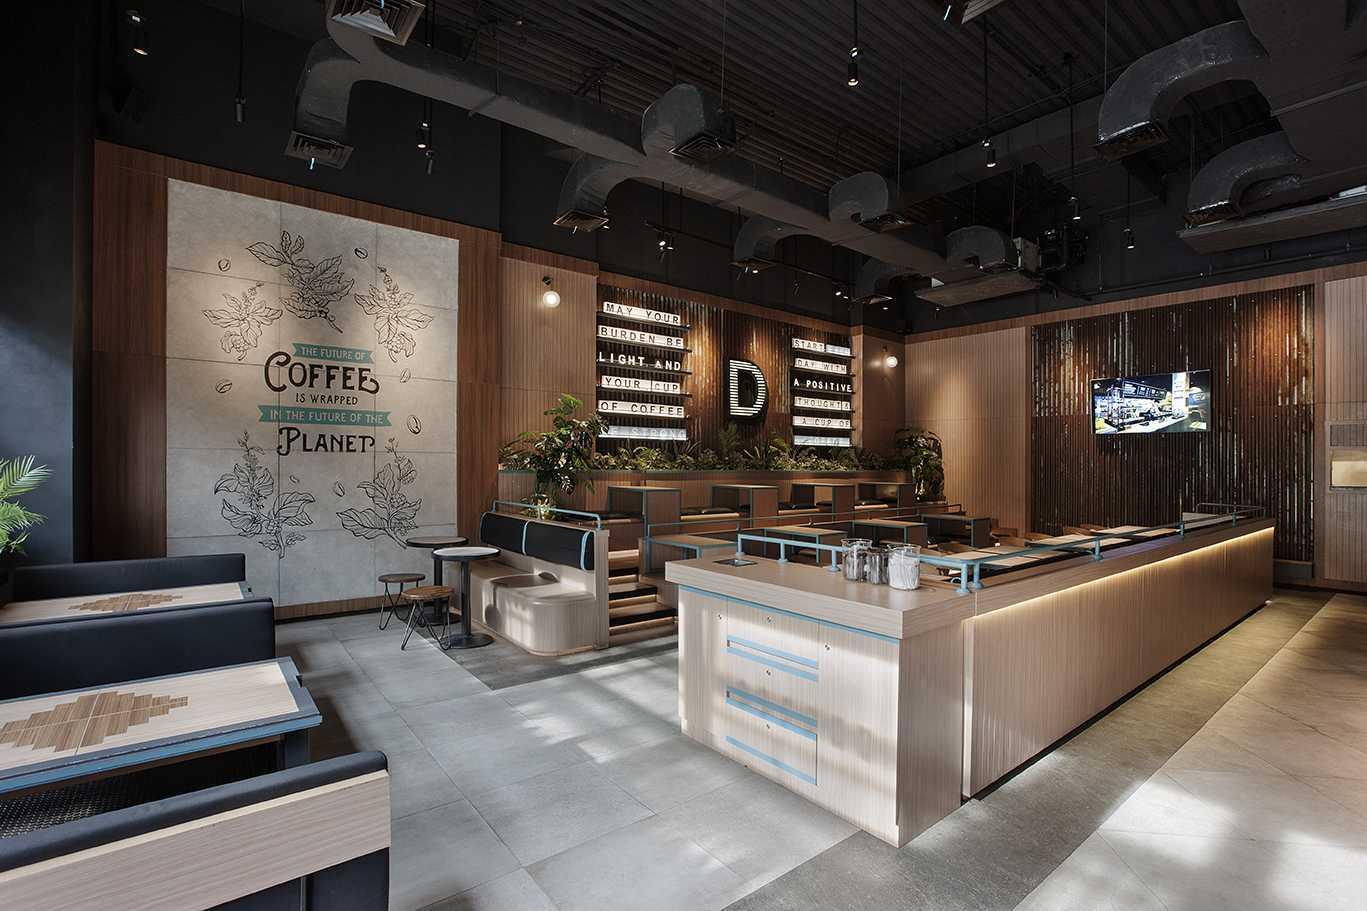 Highstreetstudio Djournal Coffee Bar Cipedes, Kec. Sukajadi, Kota Bandung, Jawa Barat, Indonesia Cipedes, Kec. Sukajadi, Kota Bandung, Jawa Barat, Indonesia Highstreetstudio-Djournal-Coffee-Bar   74361